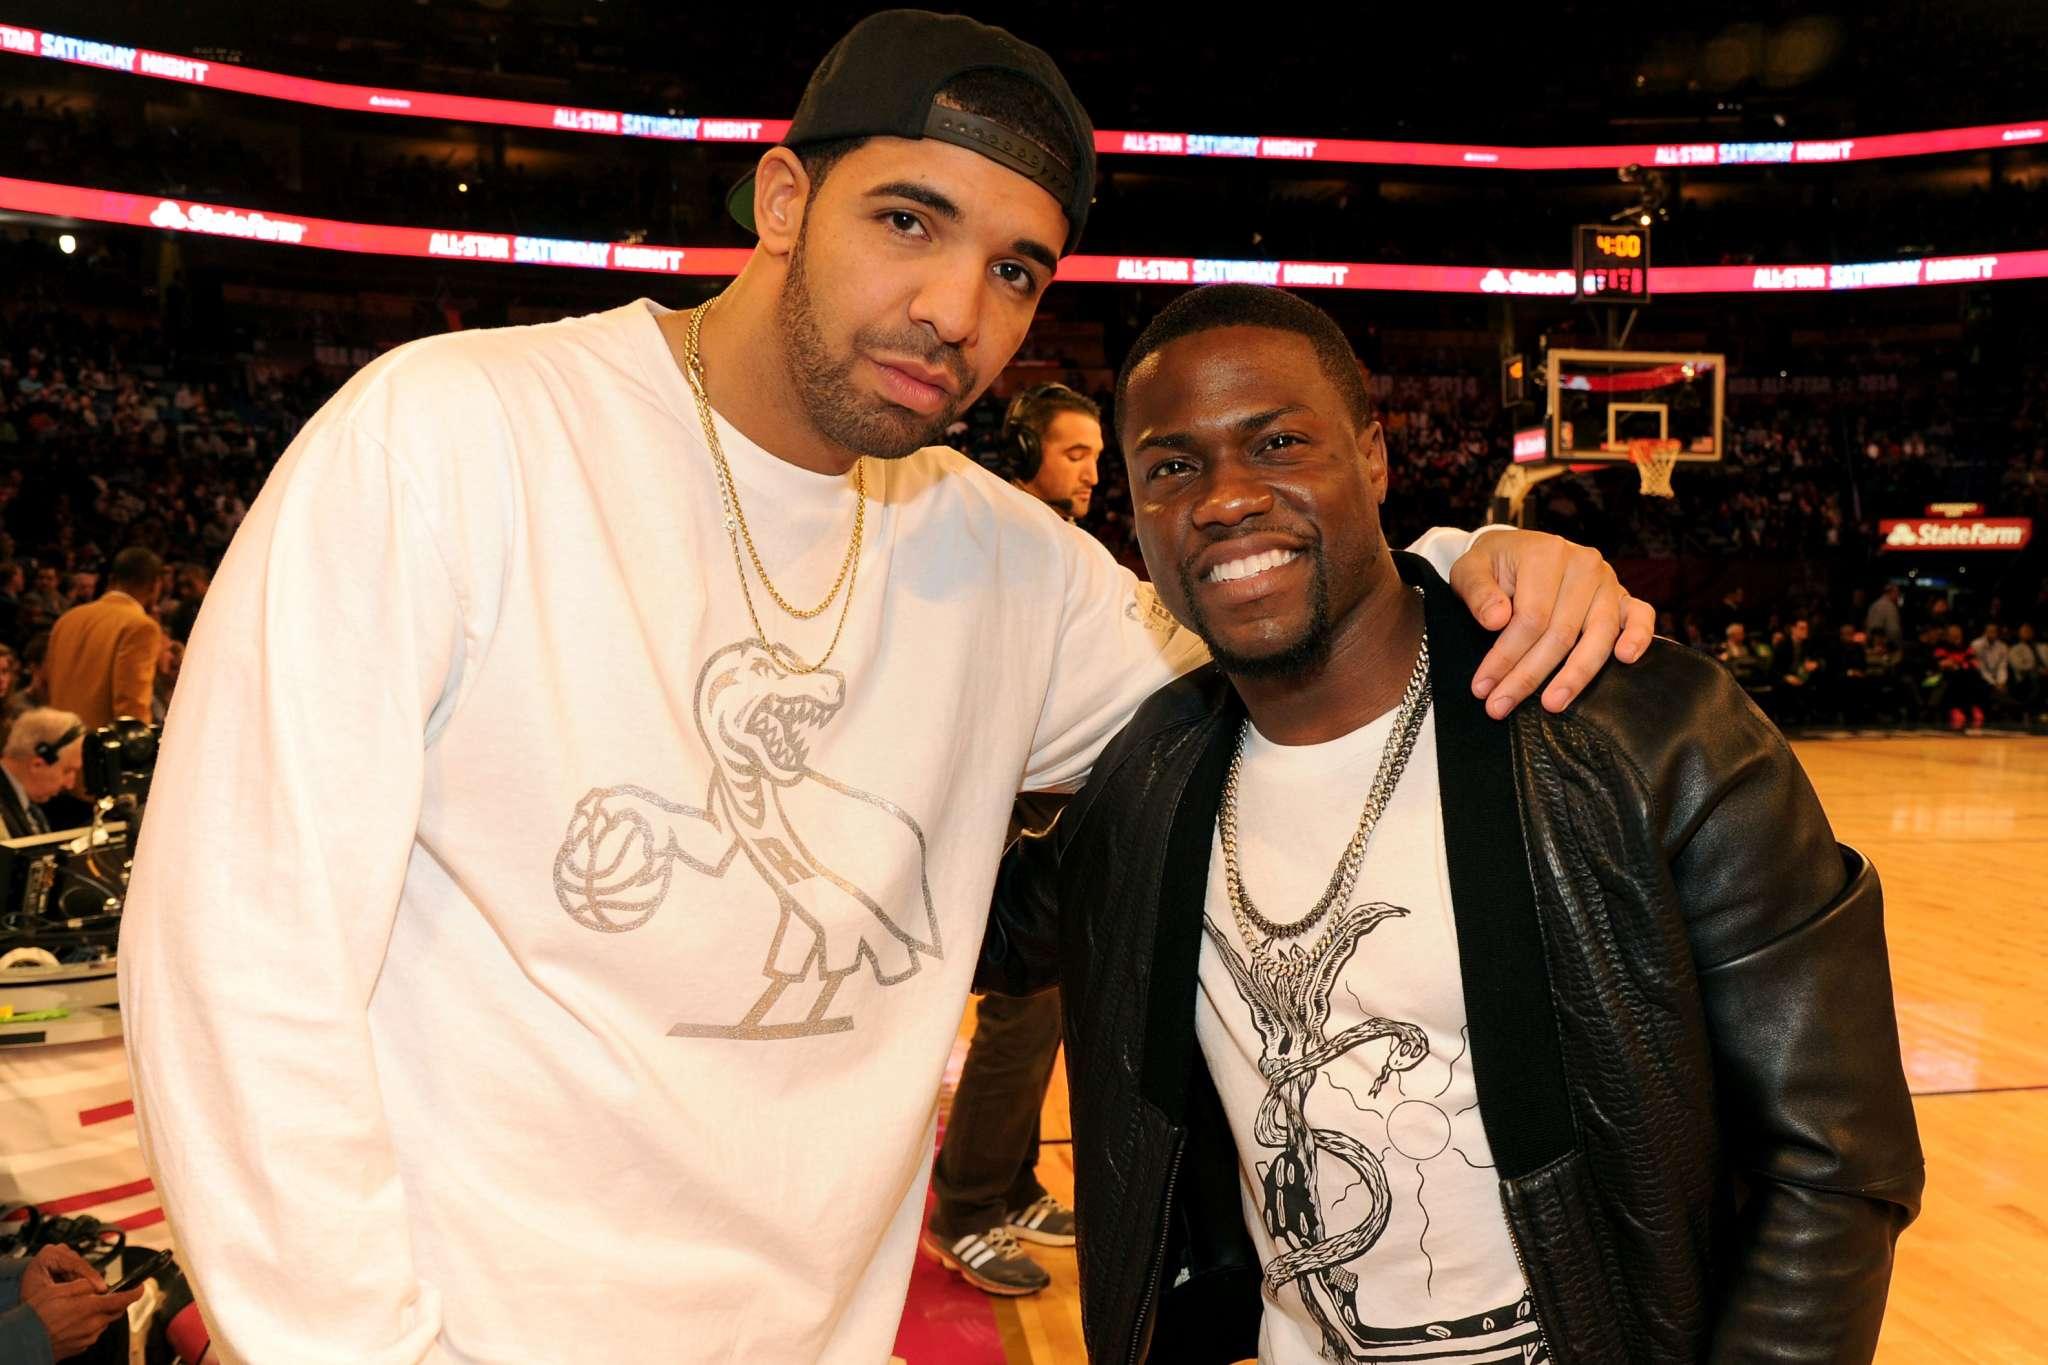 Drake Strangely Makes Fun Of Kevin Heart's Beard On Social Media: 'It's Terrible'